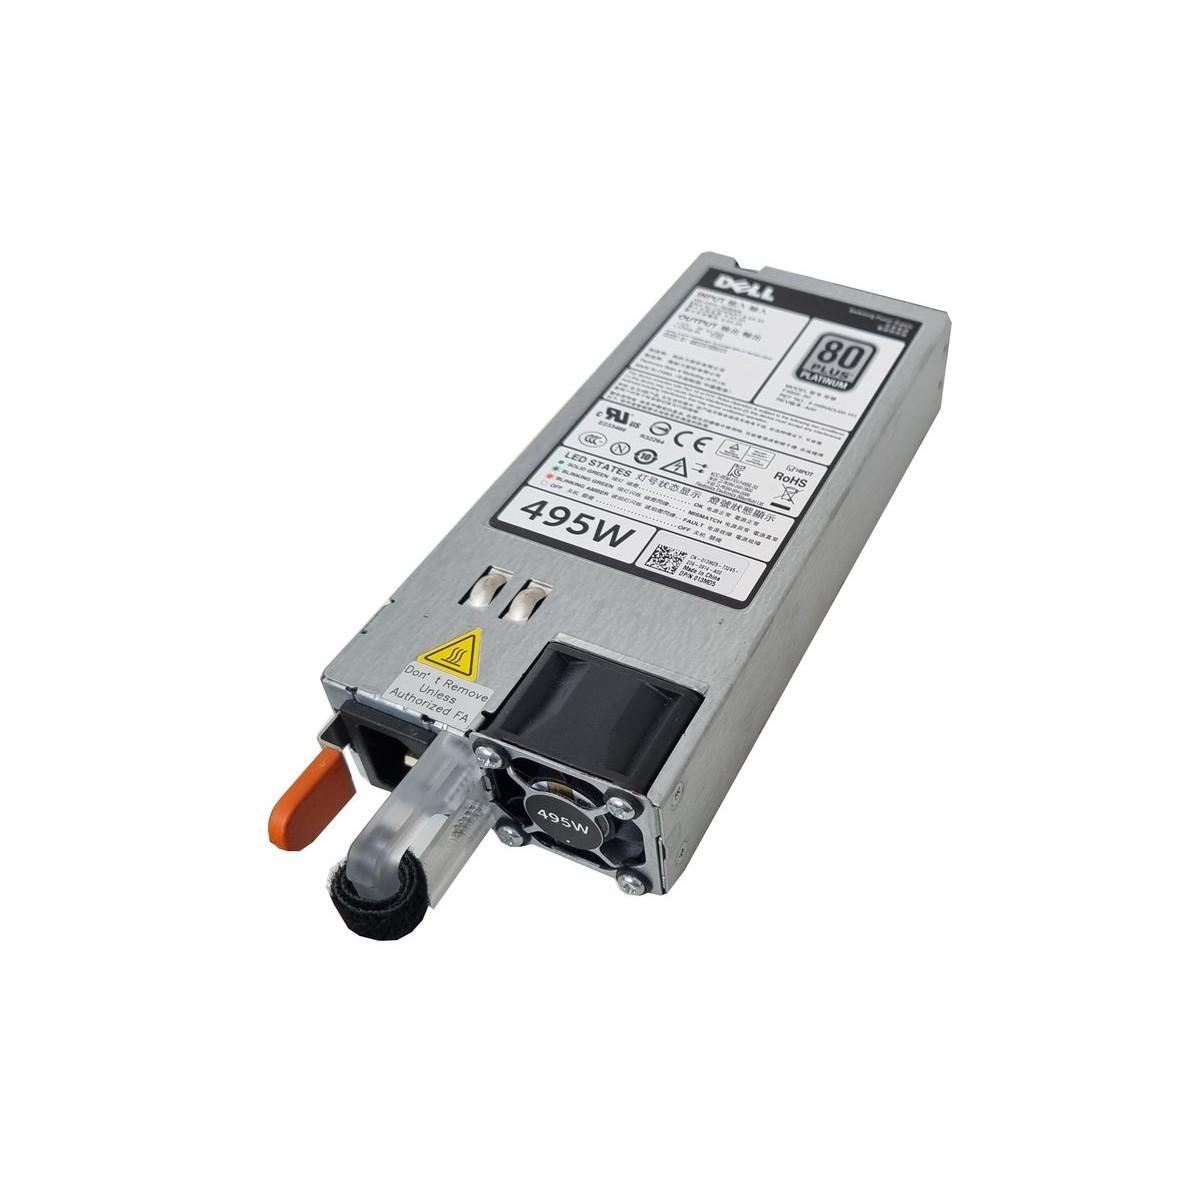 HP SMART ARRAY P212 PCI-E 2.0x 8 6Gb/s 013218-001